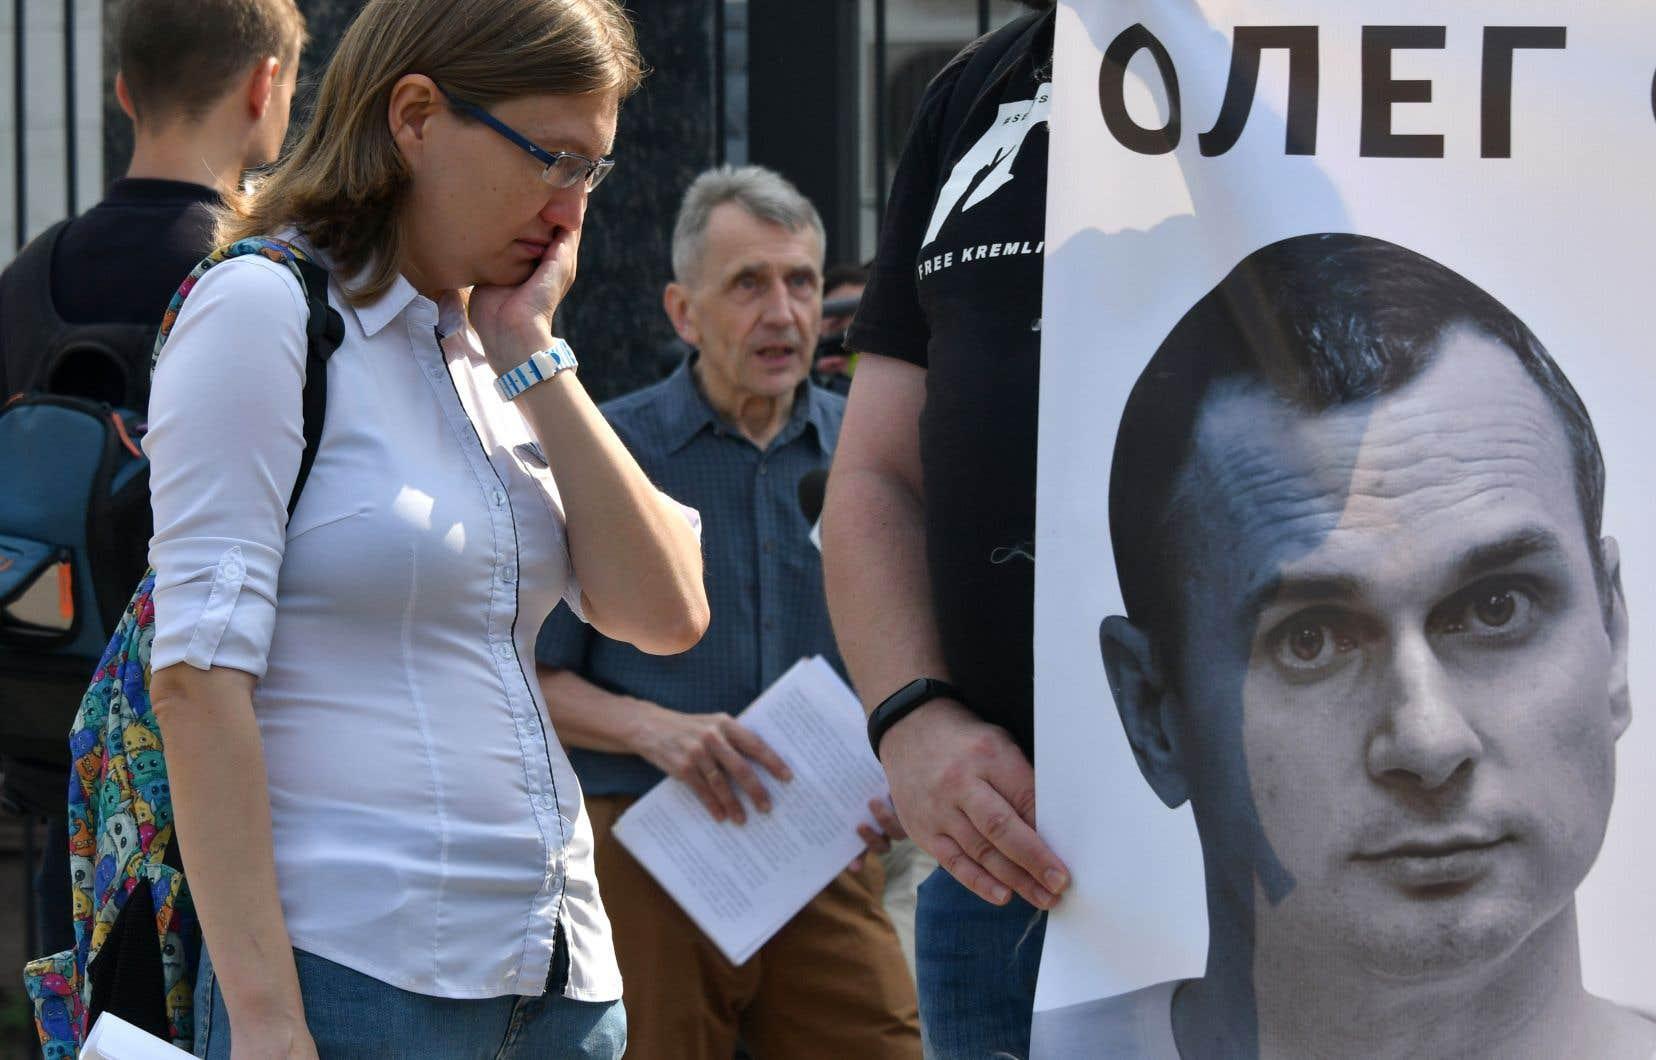 Natalya Kaplan, la cousine du cinéaste ukrainien Oleg Sentsov, manifeste devant l'ambassade de Russie à Kiev.